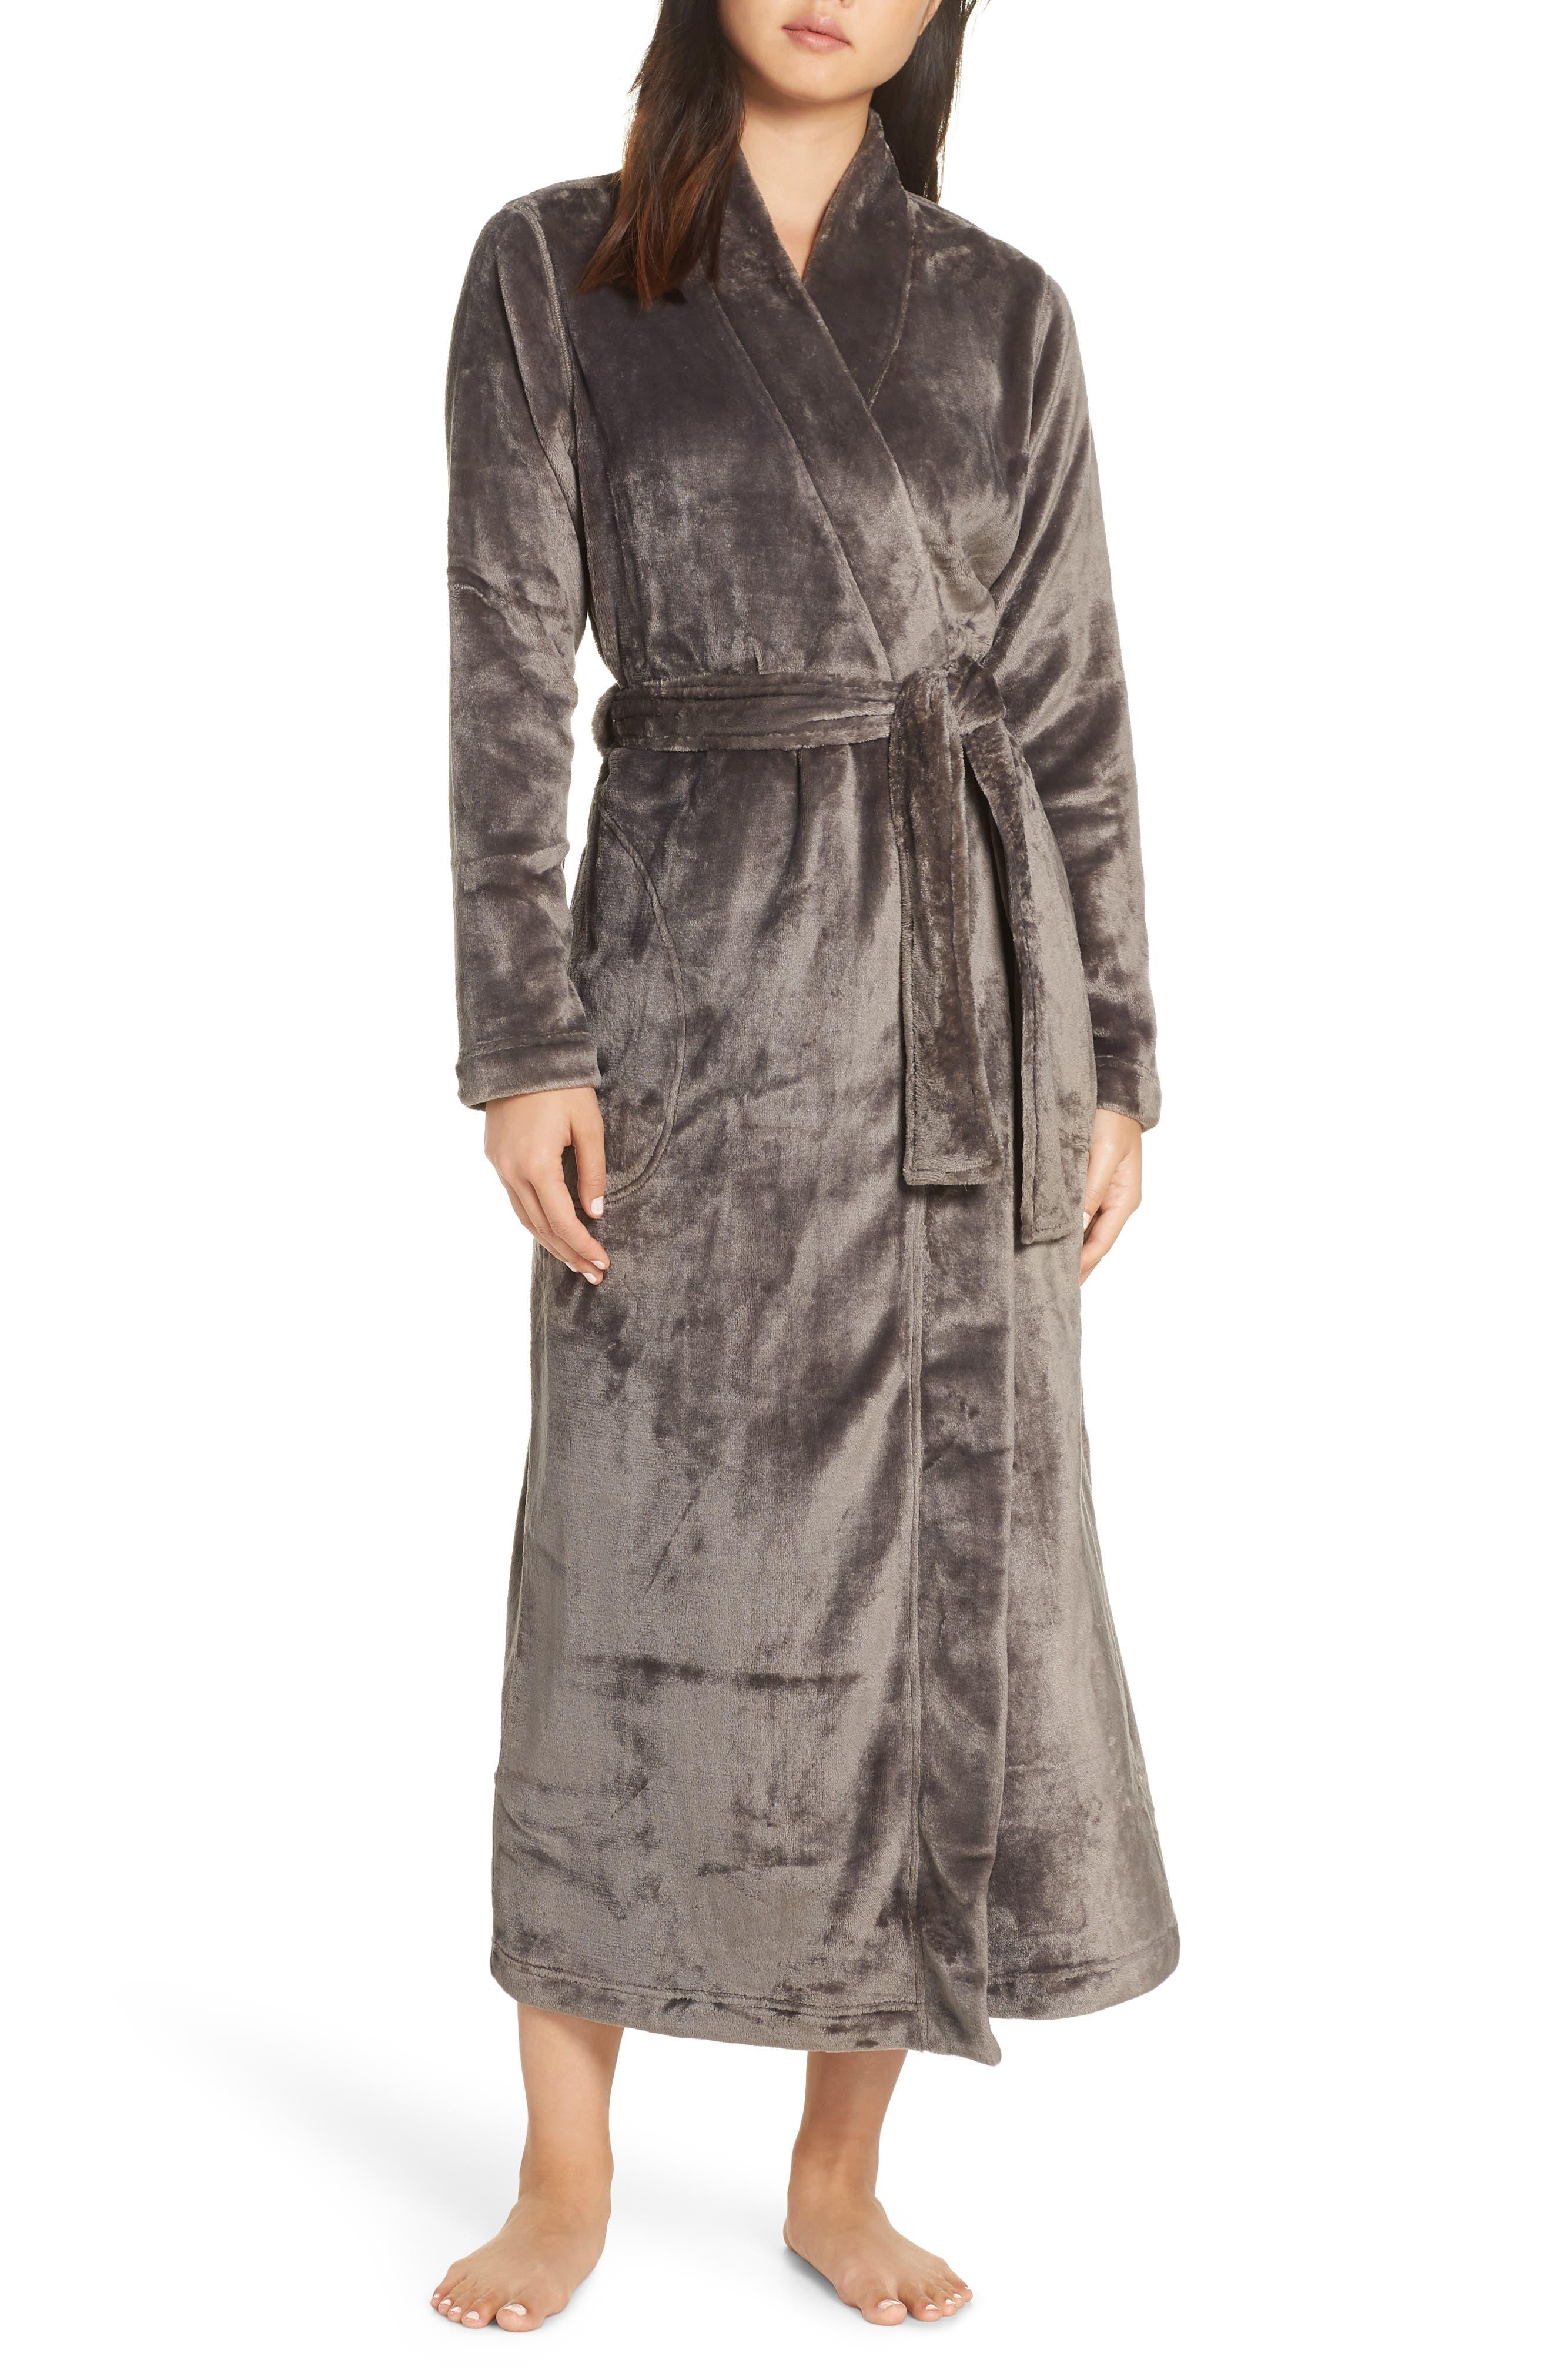 uggs robe